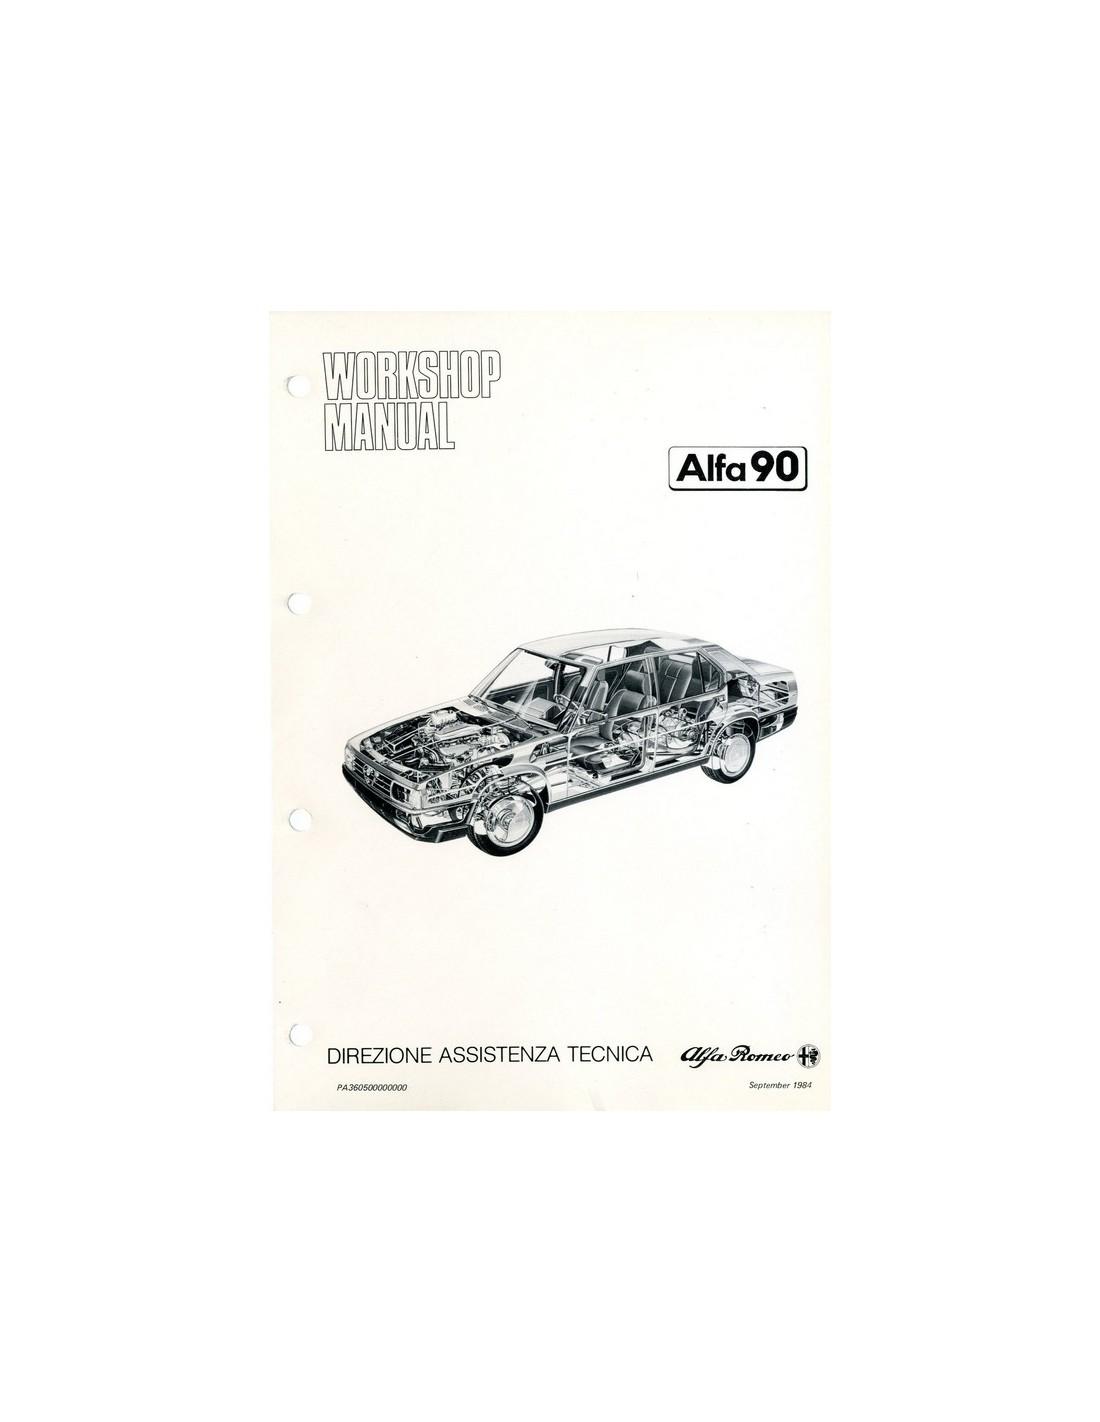 1984 ALFA ROMEO 90 WORKSHOP MANUAL ENGLISH